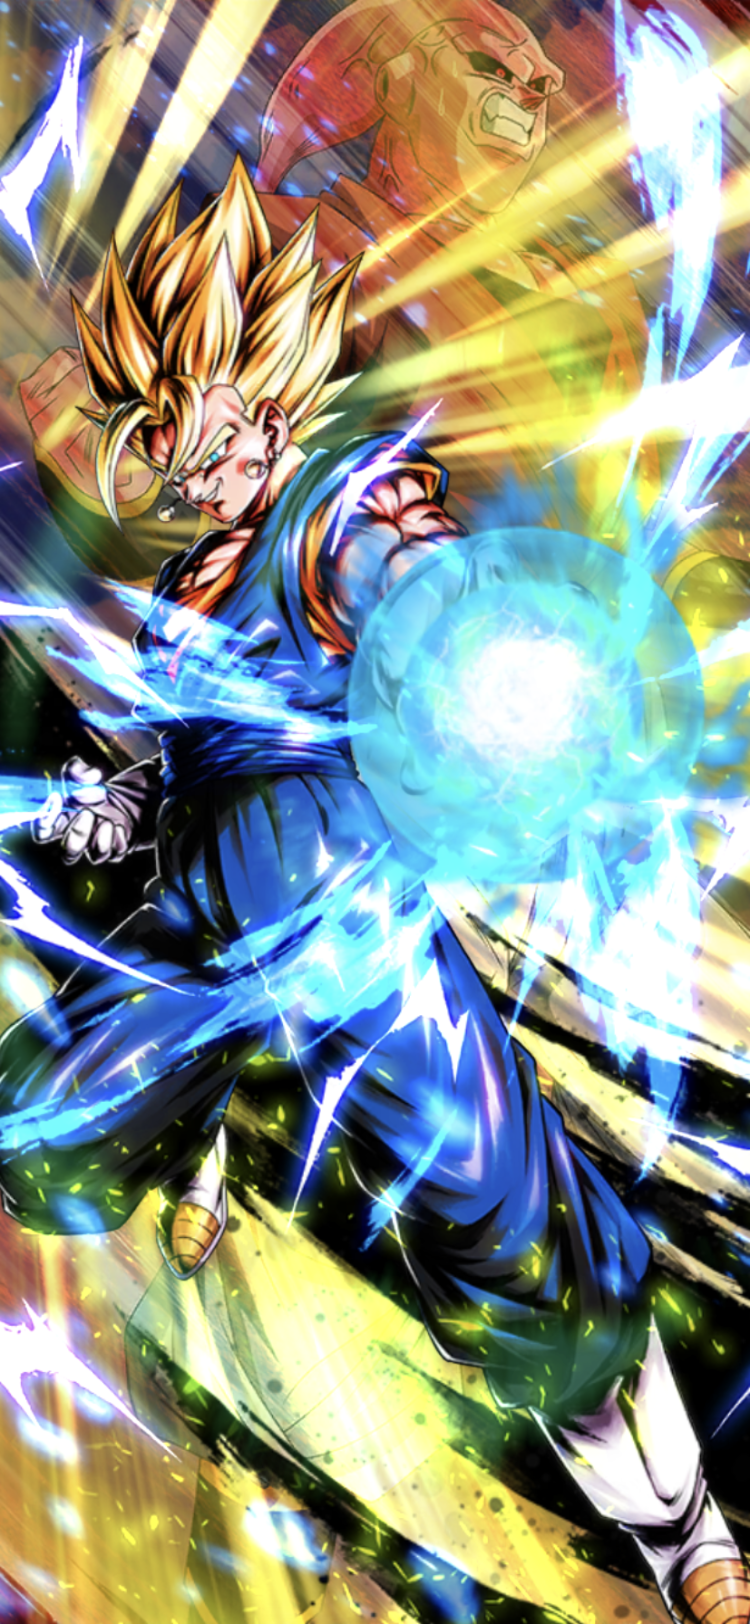 Super Vegito Dragon Ball Legends Art Dragon Ball Artwork Dragon Ball Super Manga Dragon Ball Image